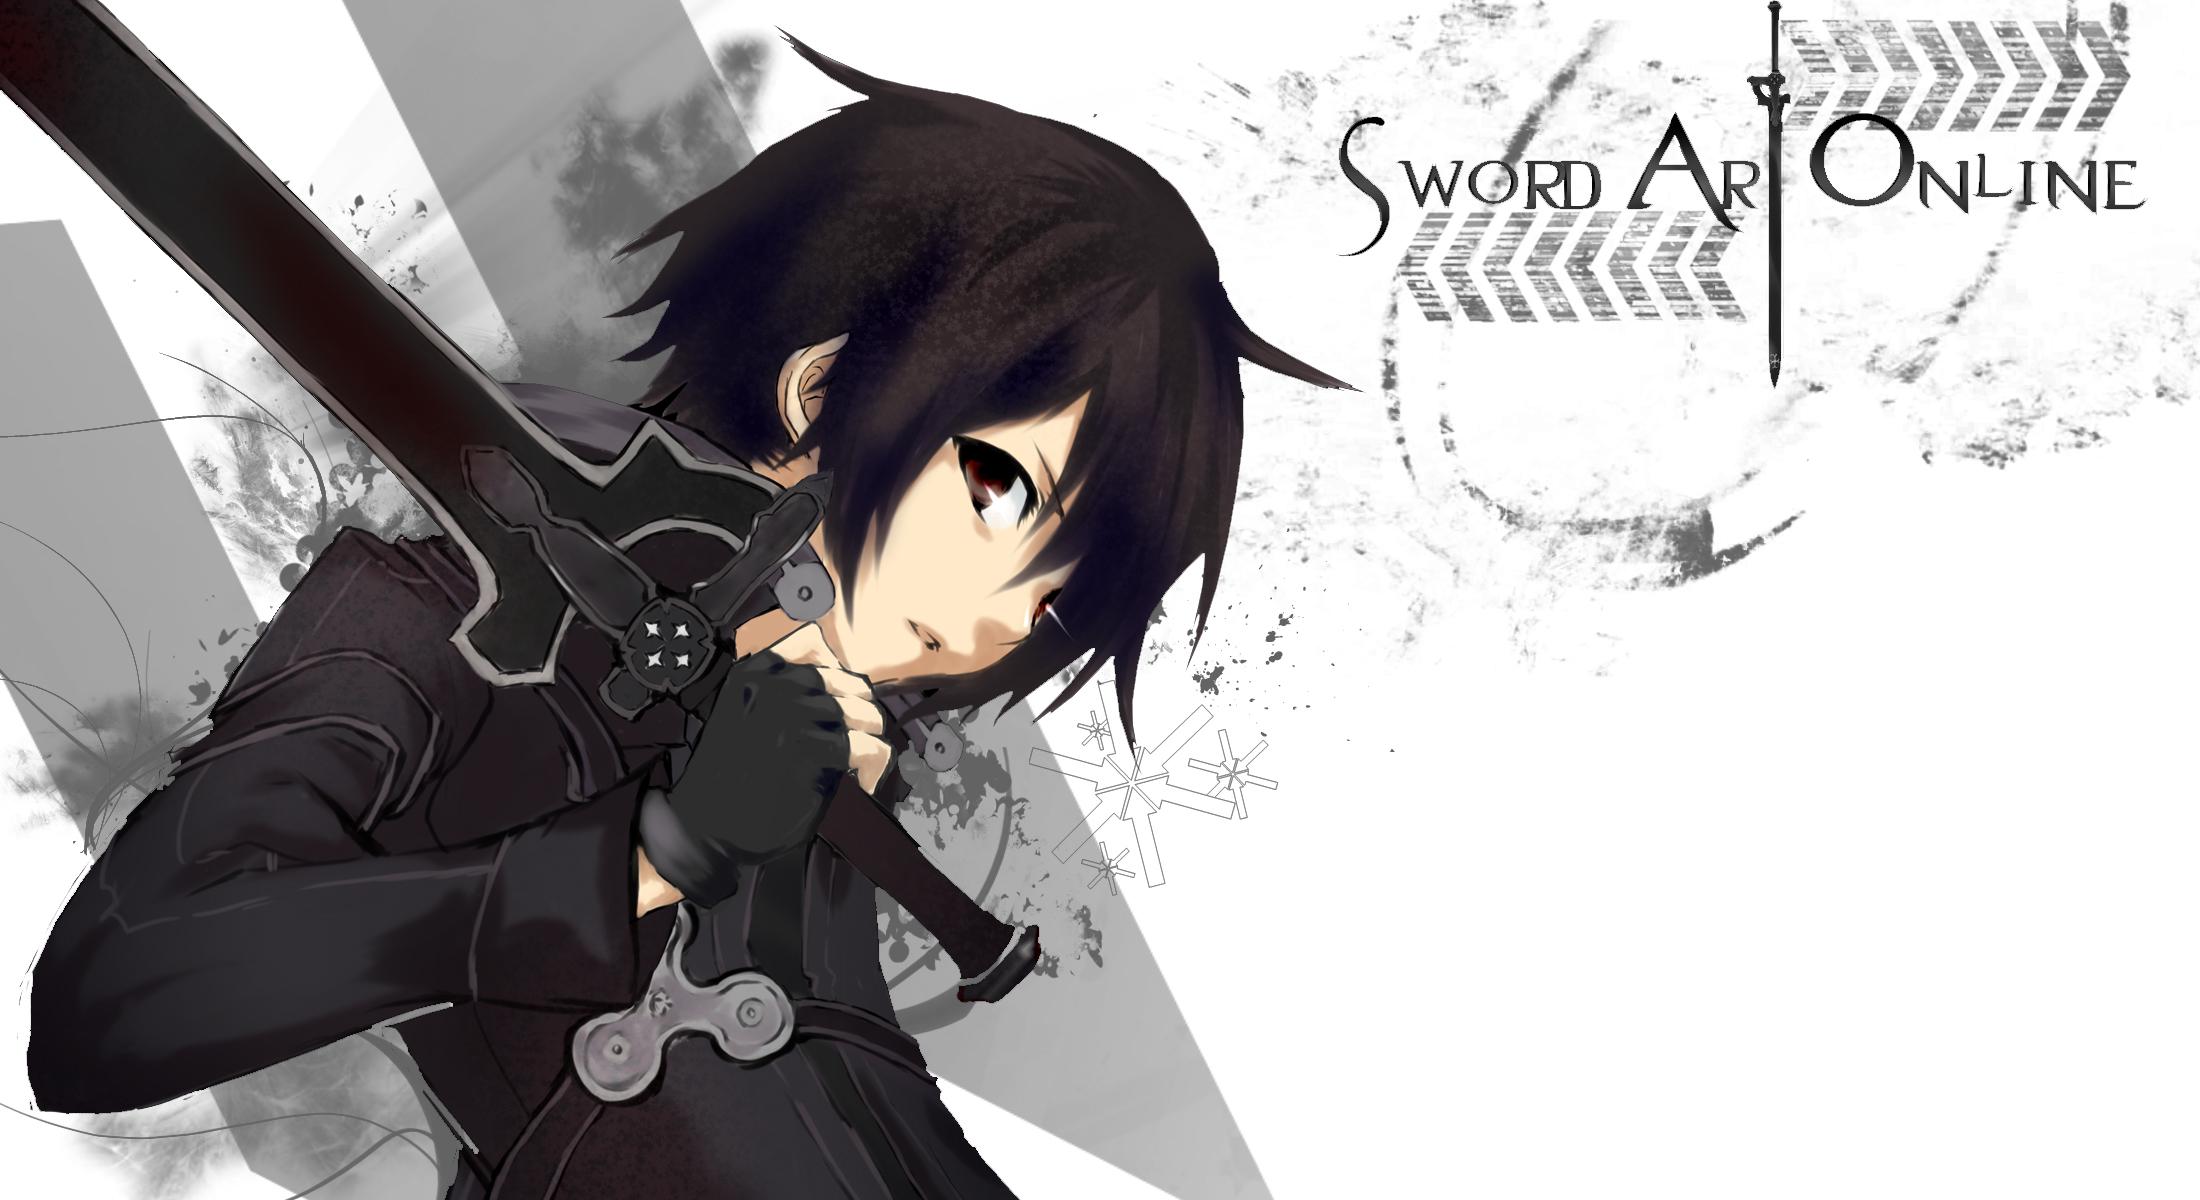 Kirito (Sword Art Online) - Wikipedia